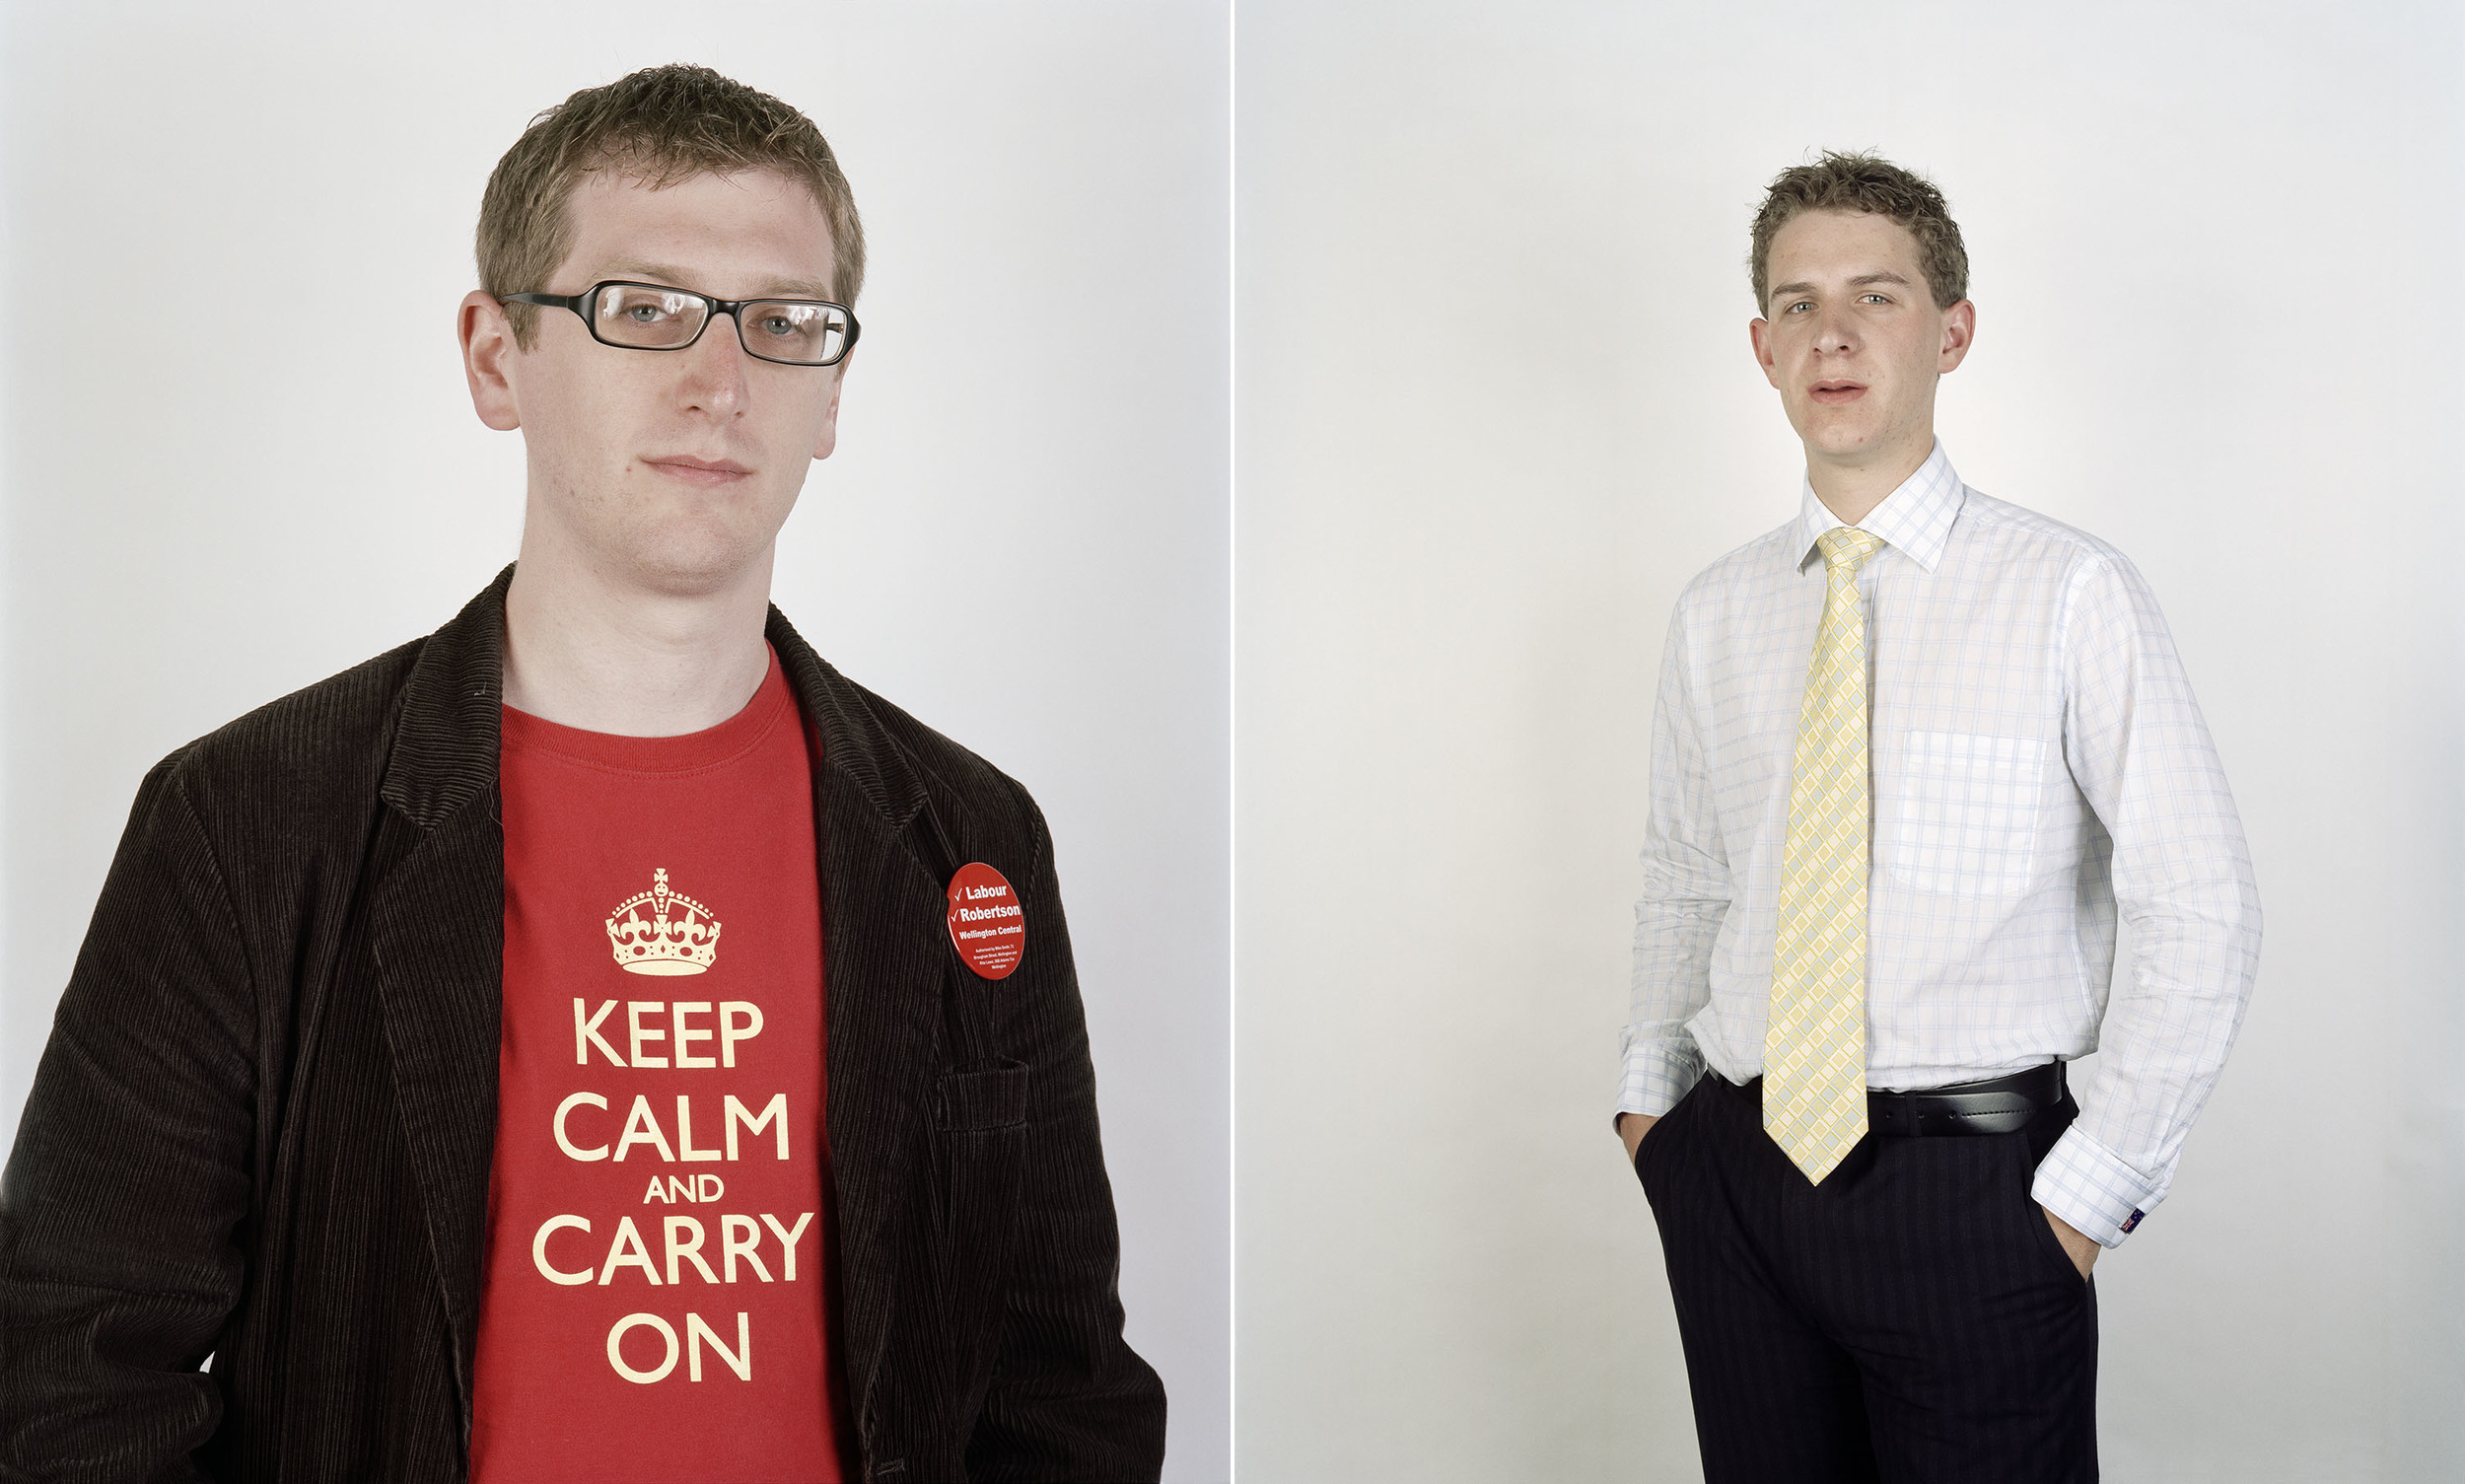 Patrick Leyland and Joshua O'Rourke